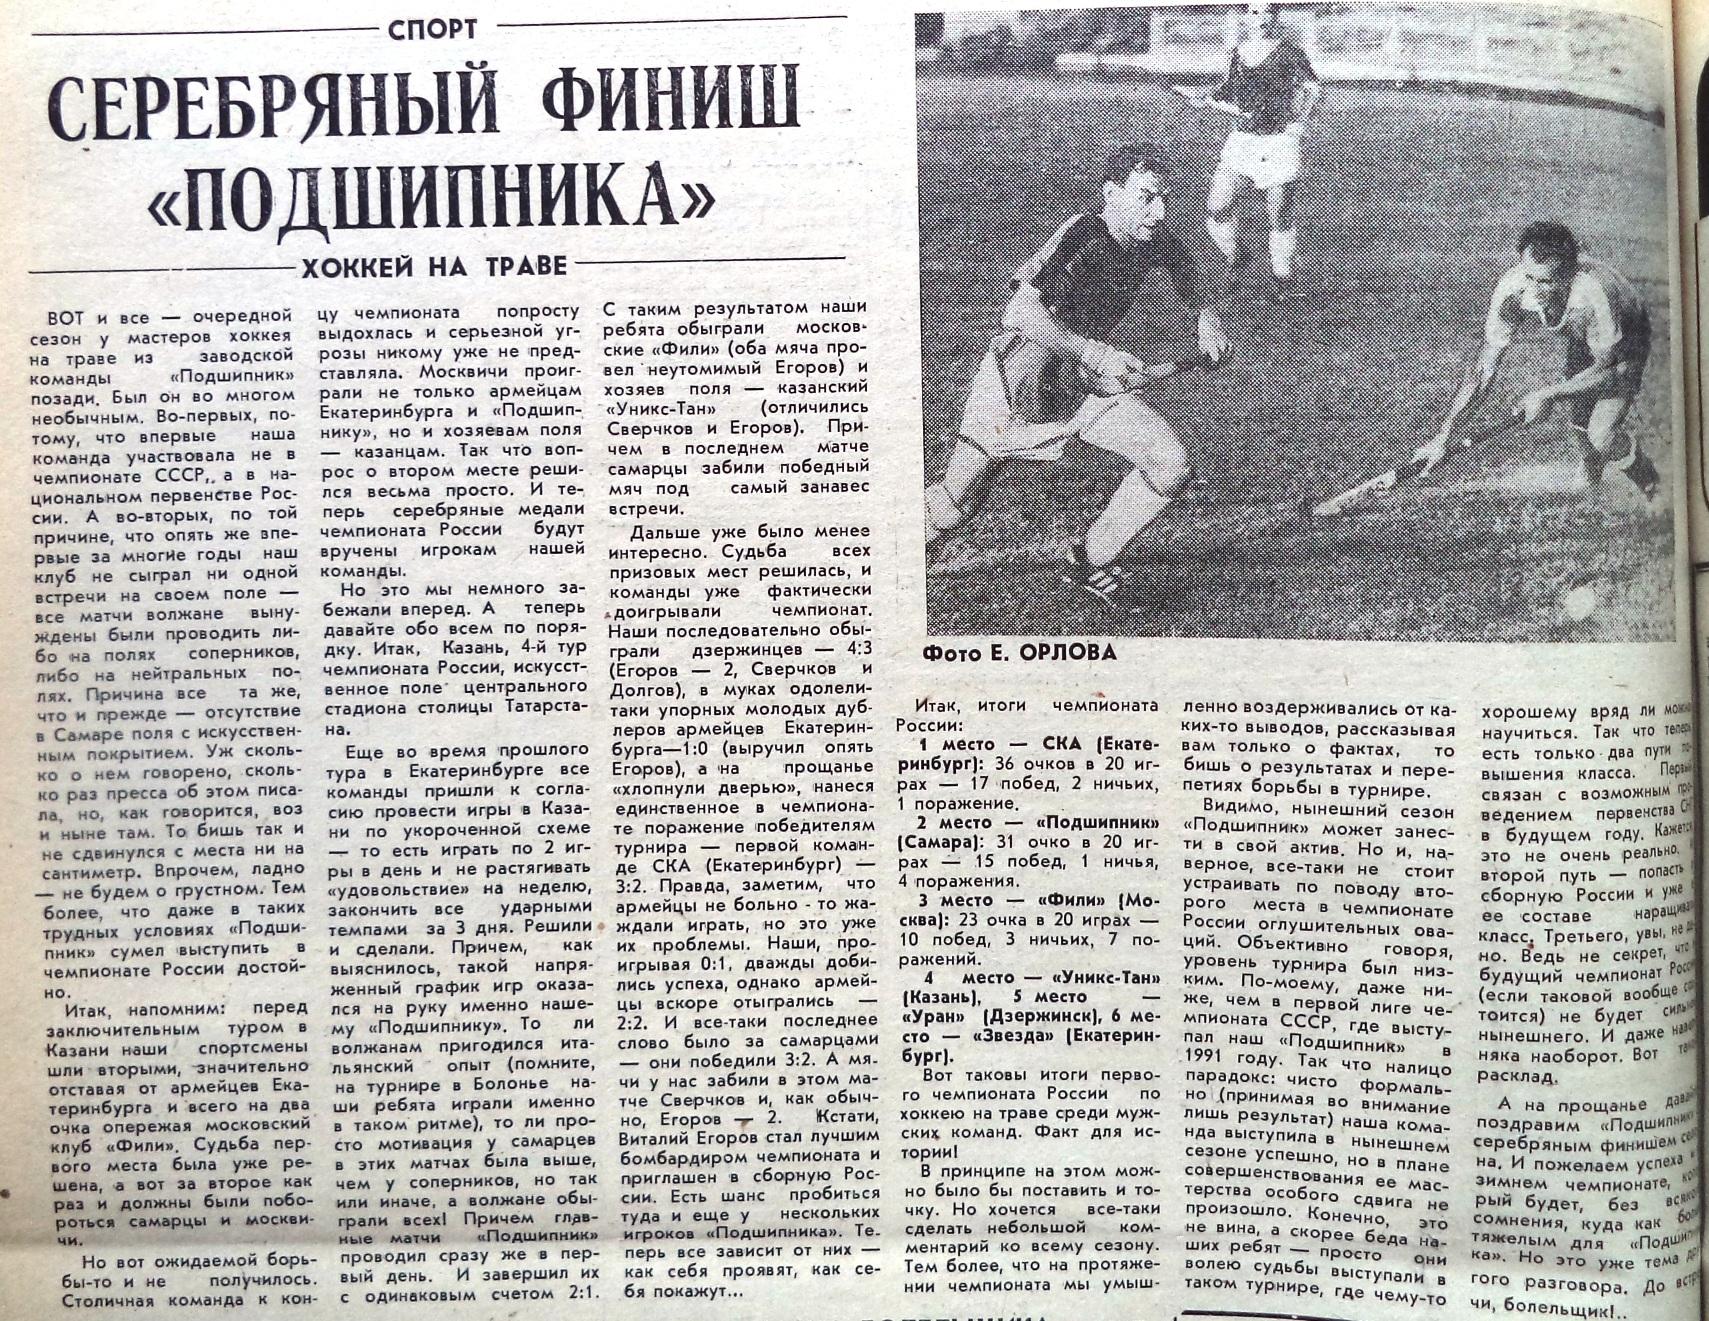 Мичурина-ФОТО-64-Красное Знамя-1992-8 октября